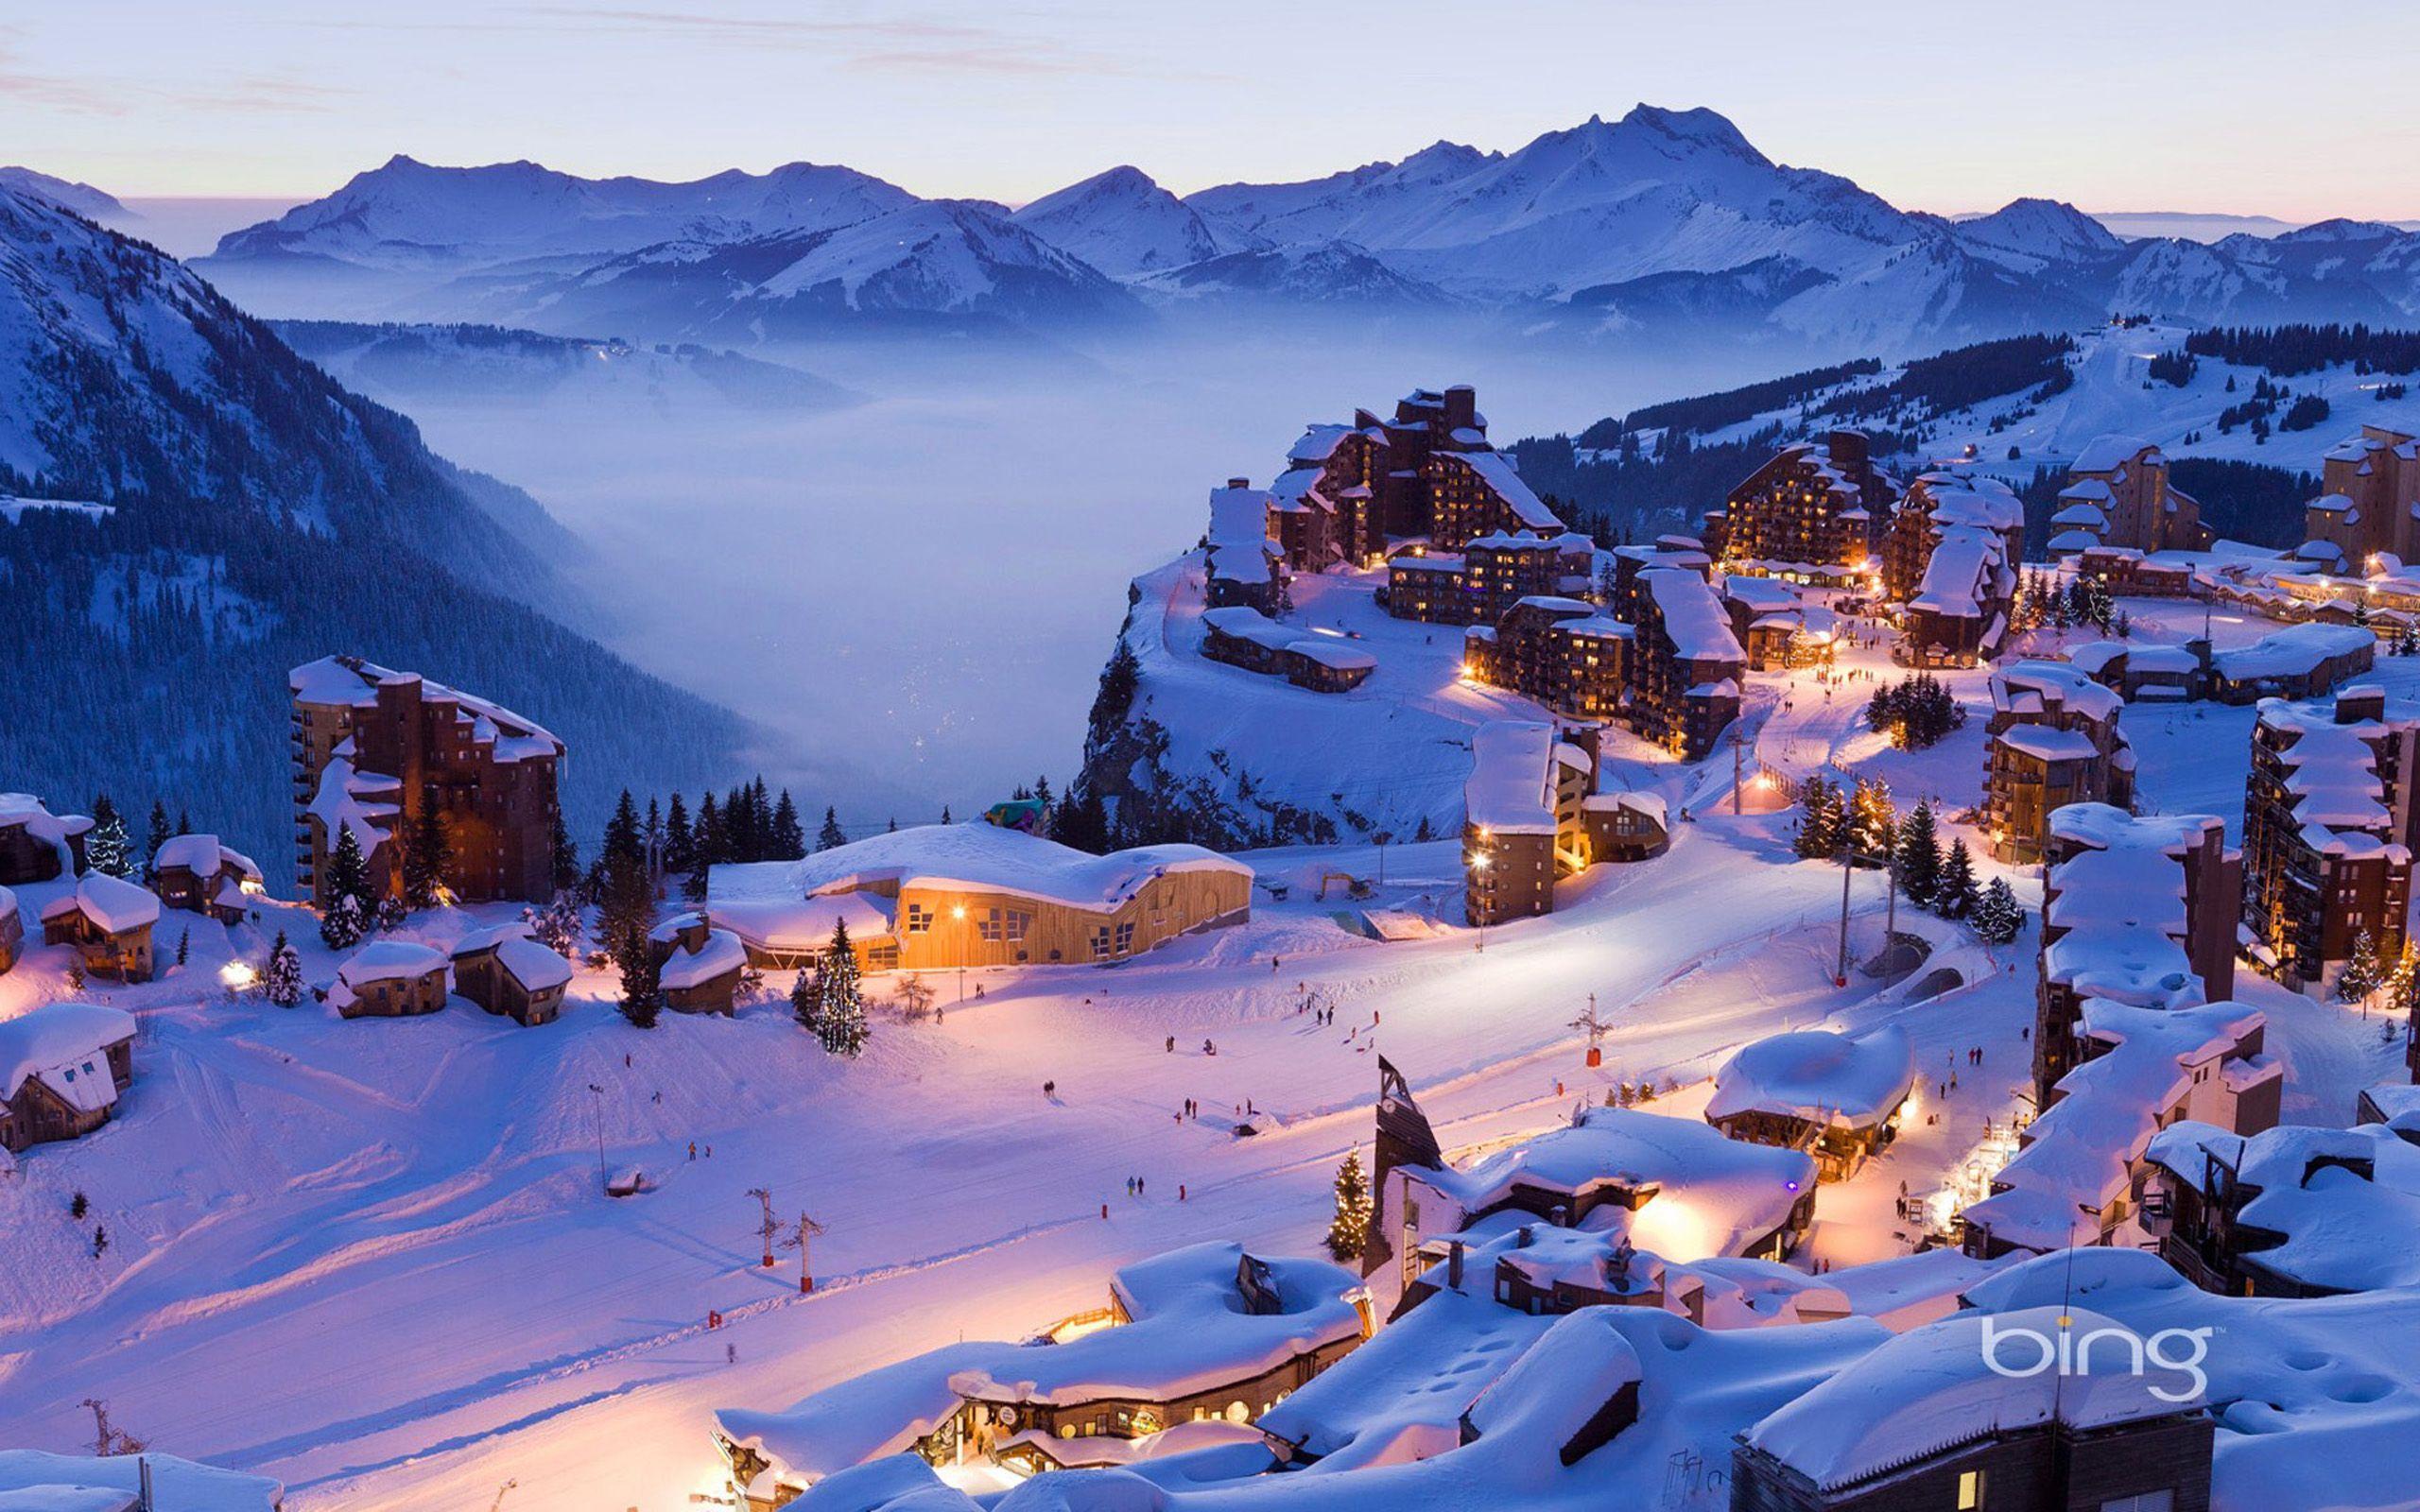 Ski Town Wallpapers   Top Ski Town Backgrounds   WallpaperAccess 2560x1600